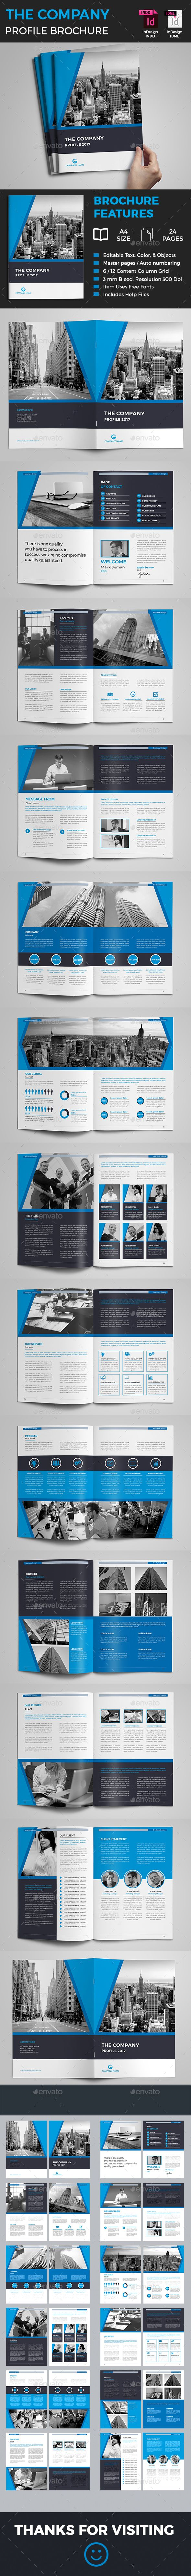 Company Profile | Company profile, Brochures and Corporate brochure